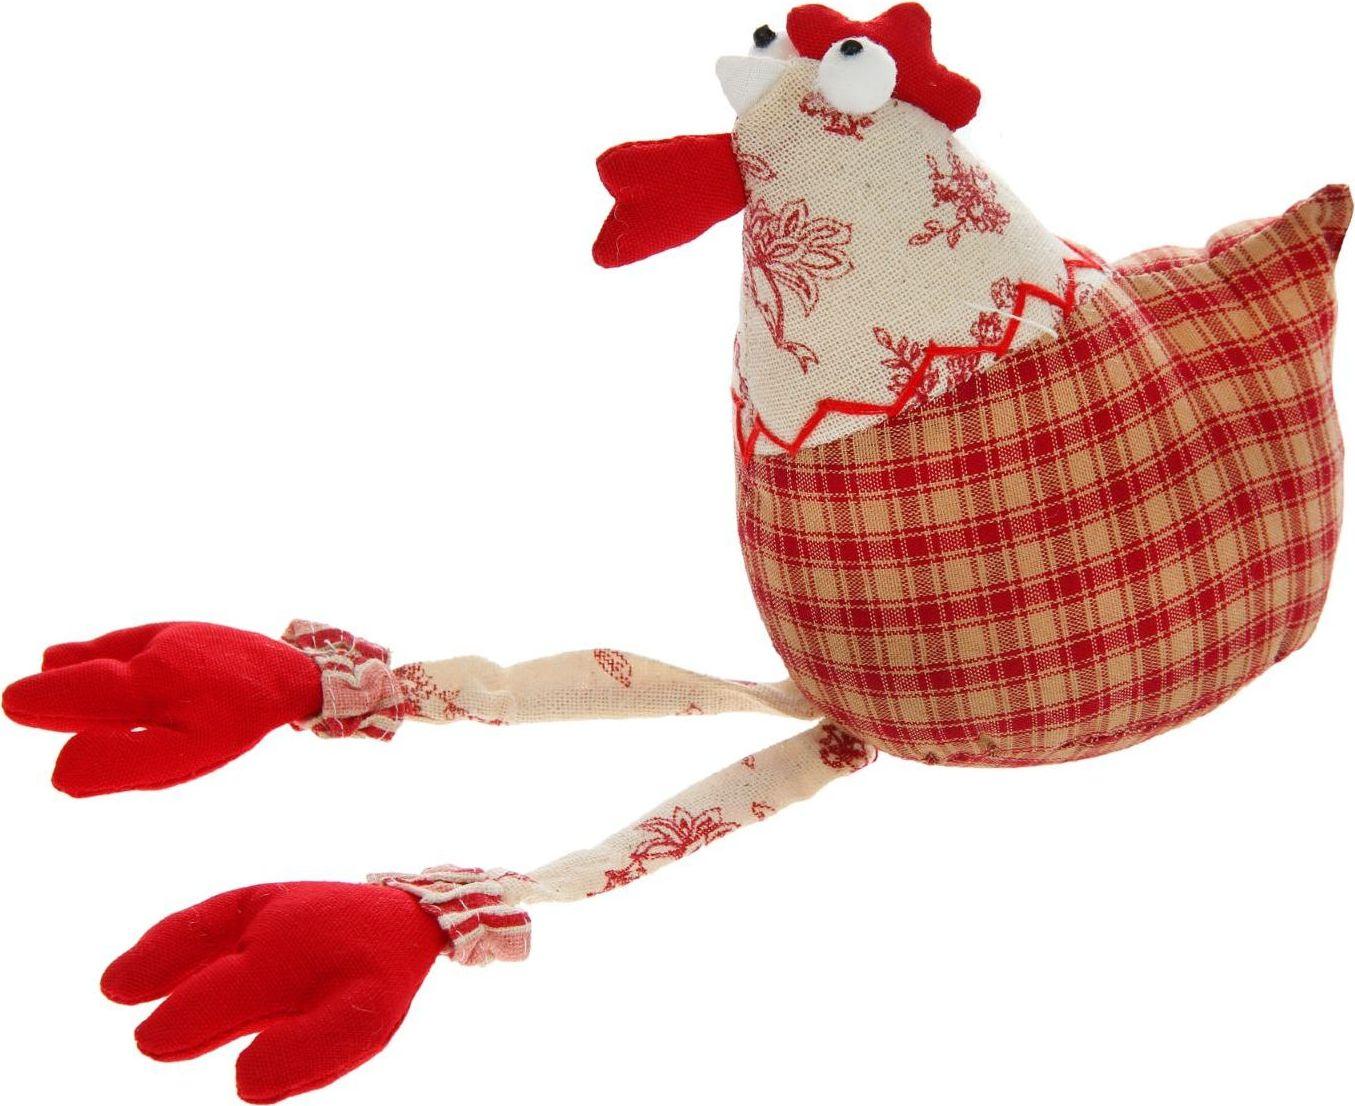 Sima-land Мягкая игрушка Курочка с висячими лапками 1047977 sima land мягкая игрушка курочка с висячими лапками 1047977